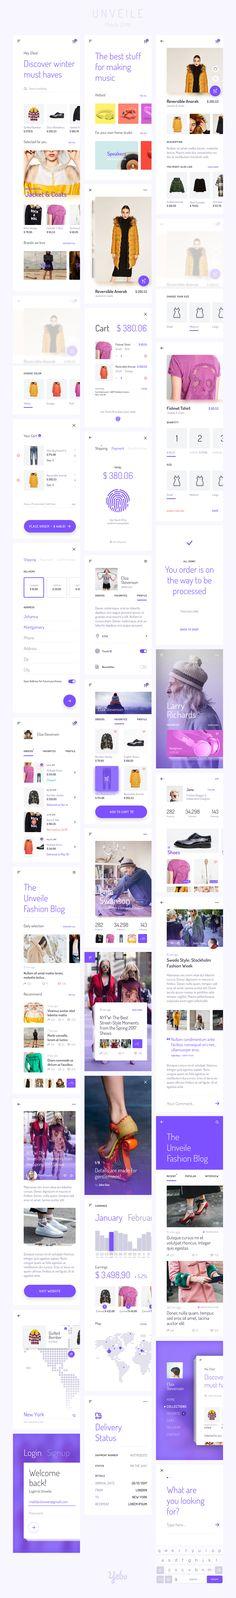 Unveile Fashion Mobile UI Kit -  30 Screen E-Commerce, Articles, Social iOS UI Kit